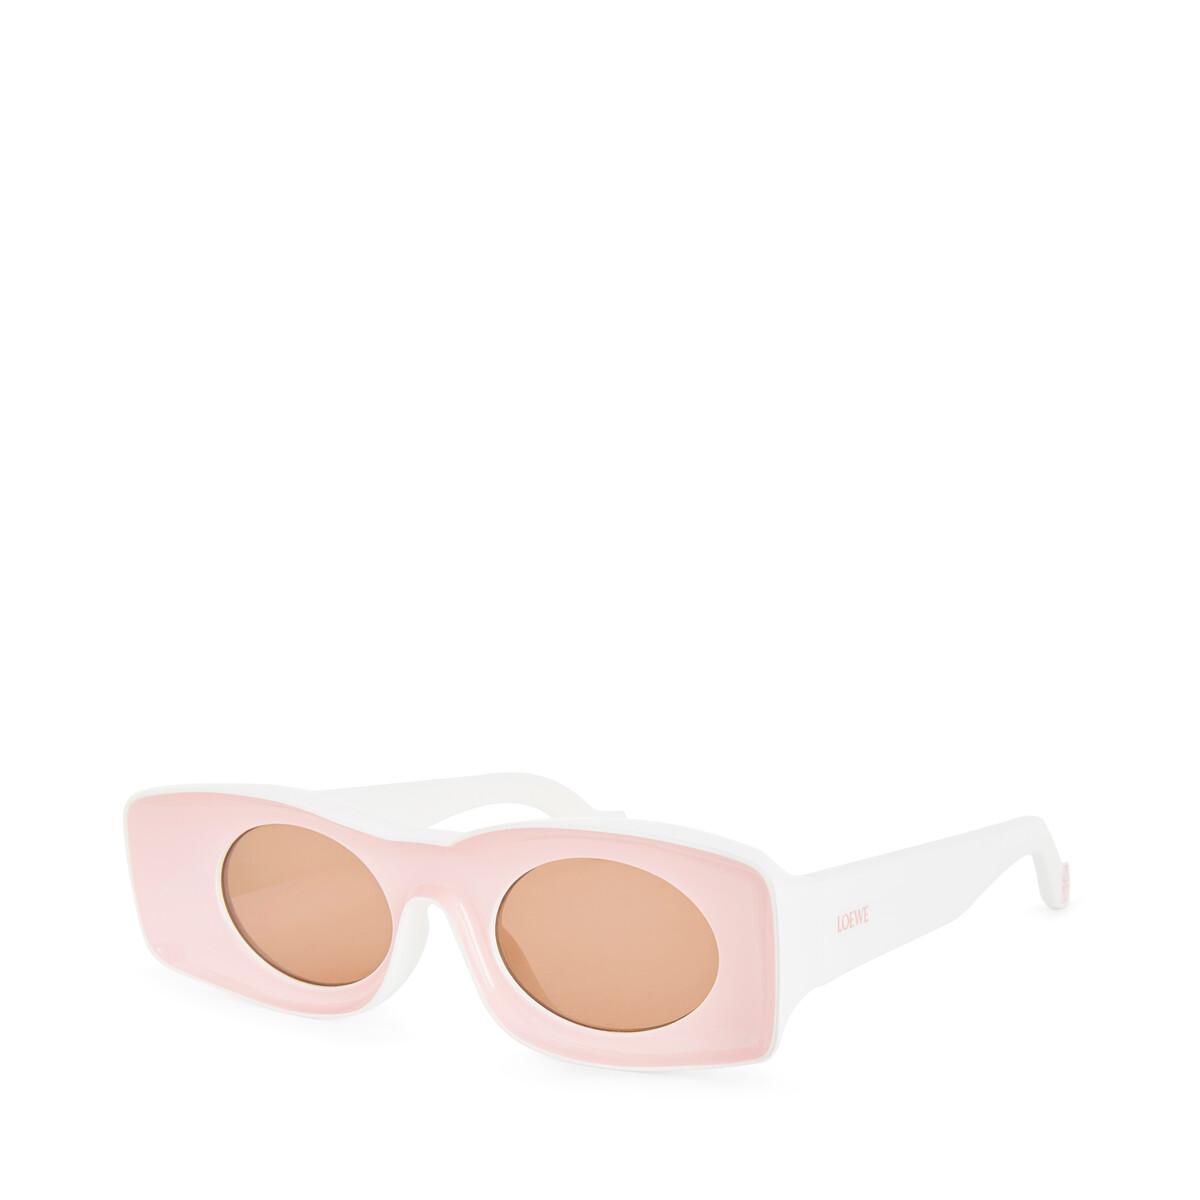 LOEWE Paula Sunglasses Pink/White front